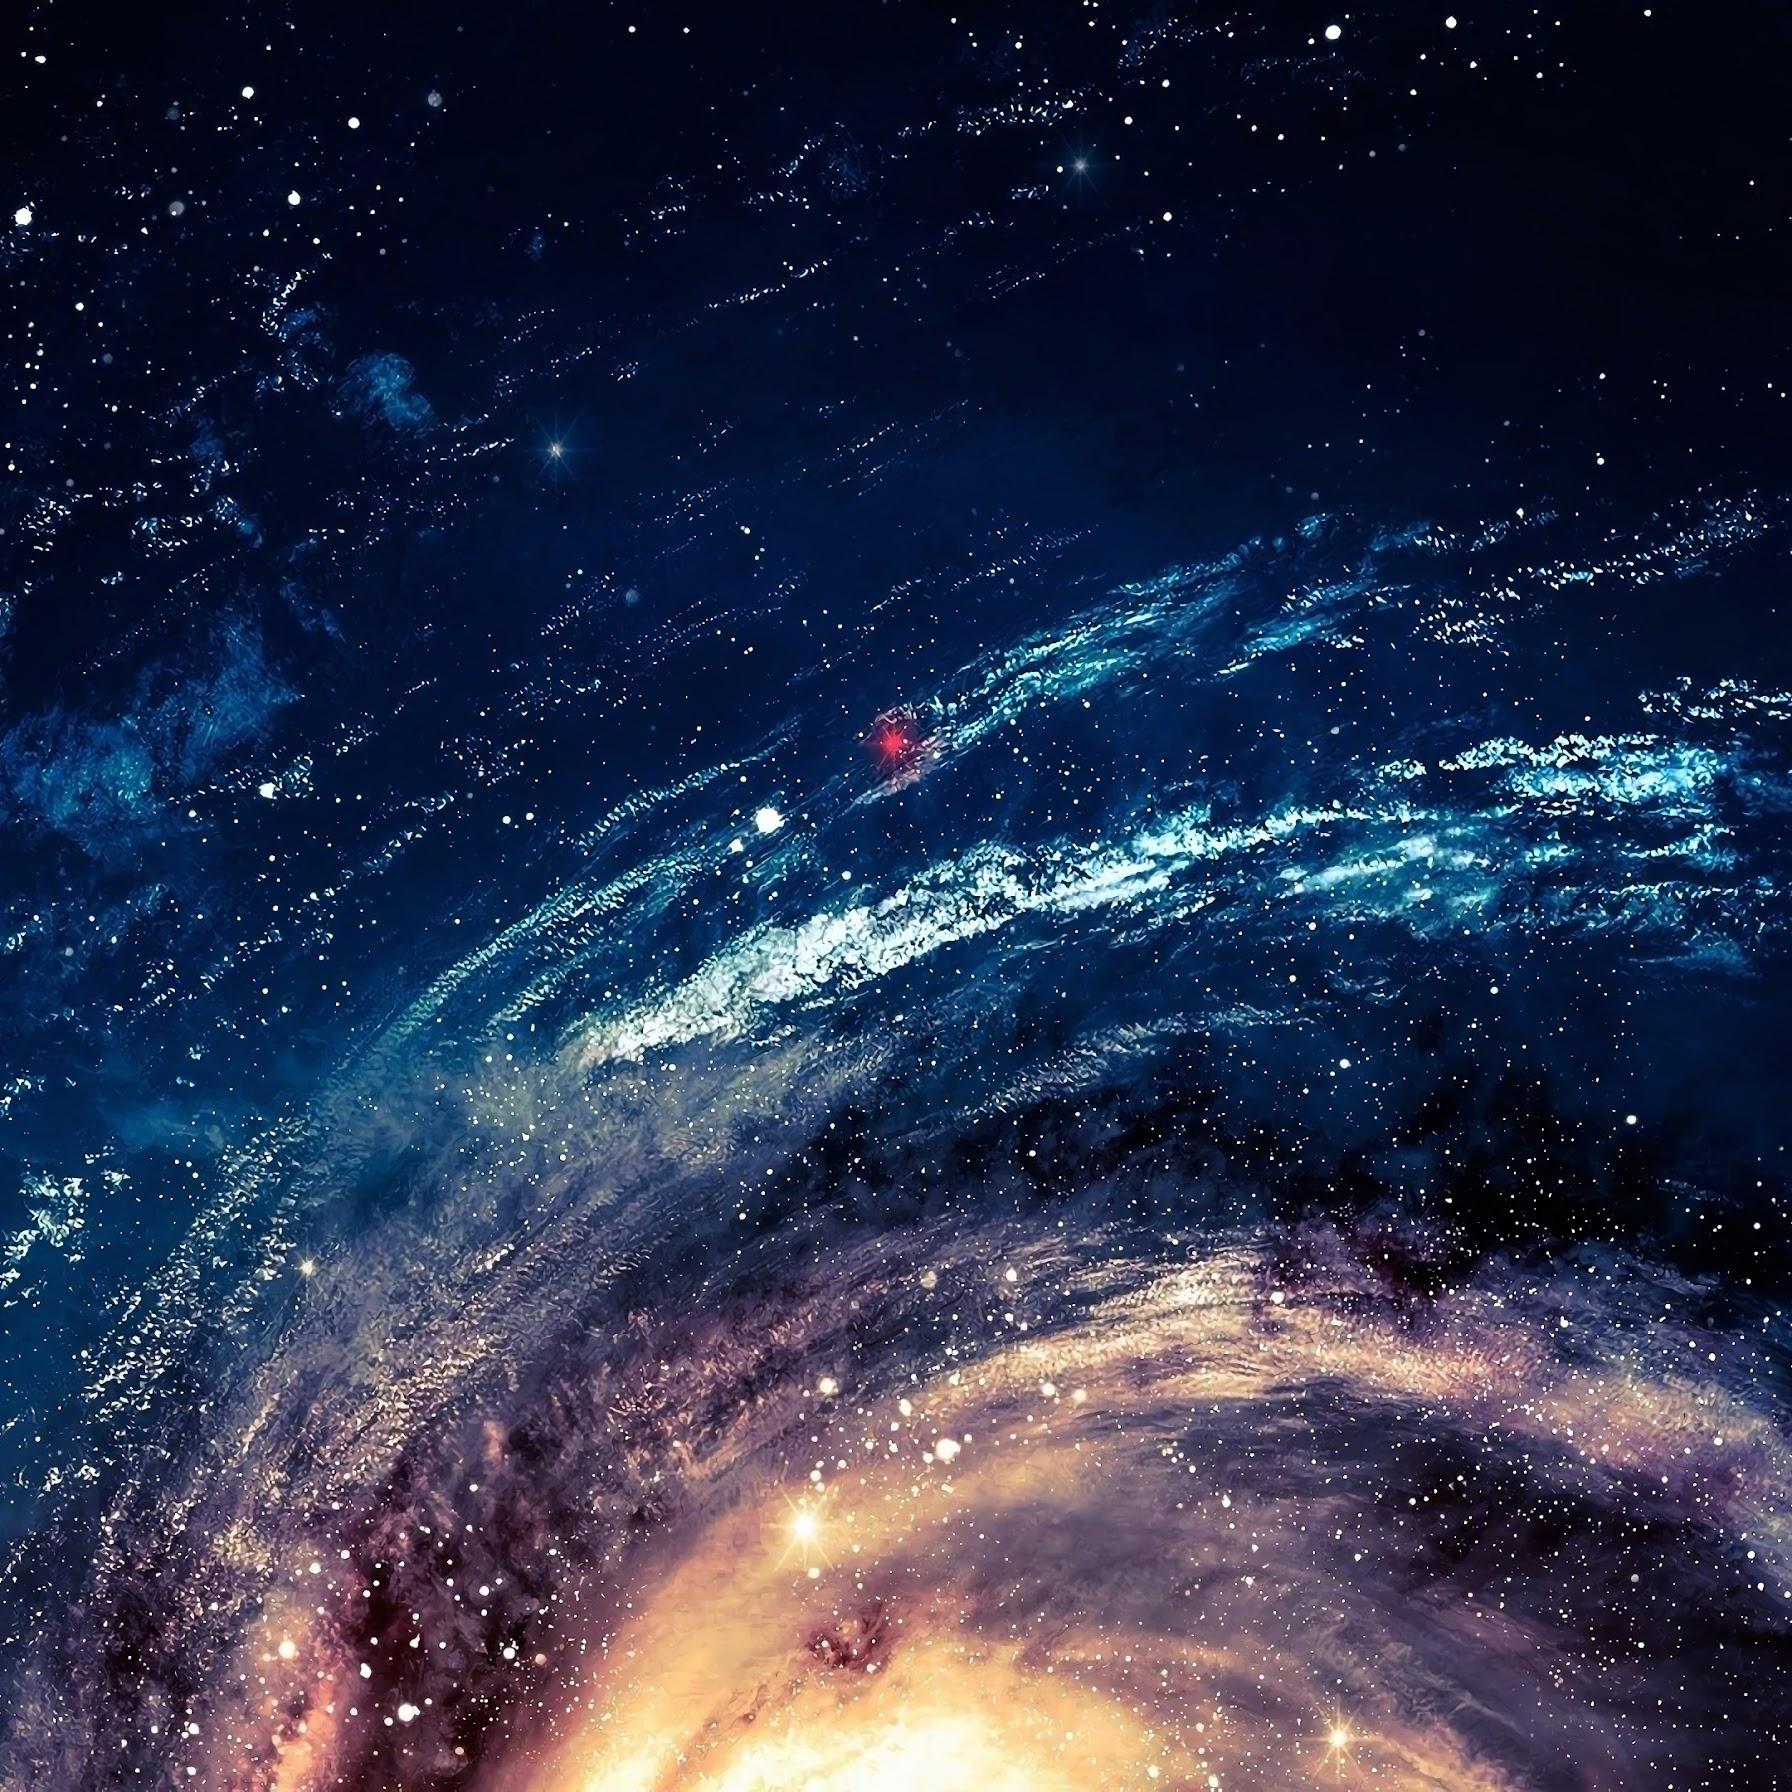 Galaxy Space Stars Background 4k 3840x2160 29 Wallpaper